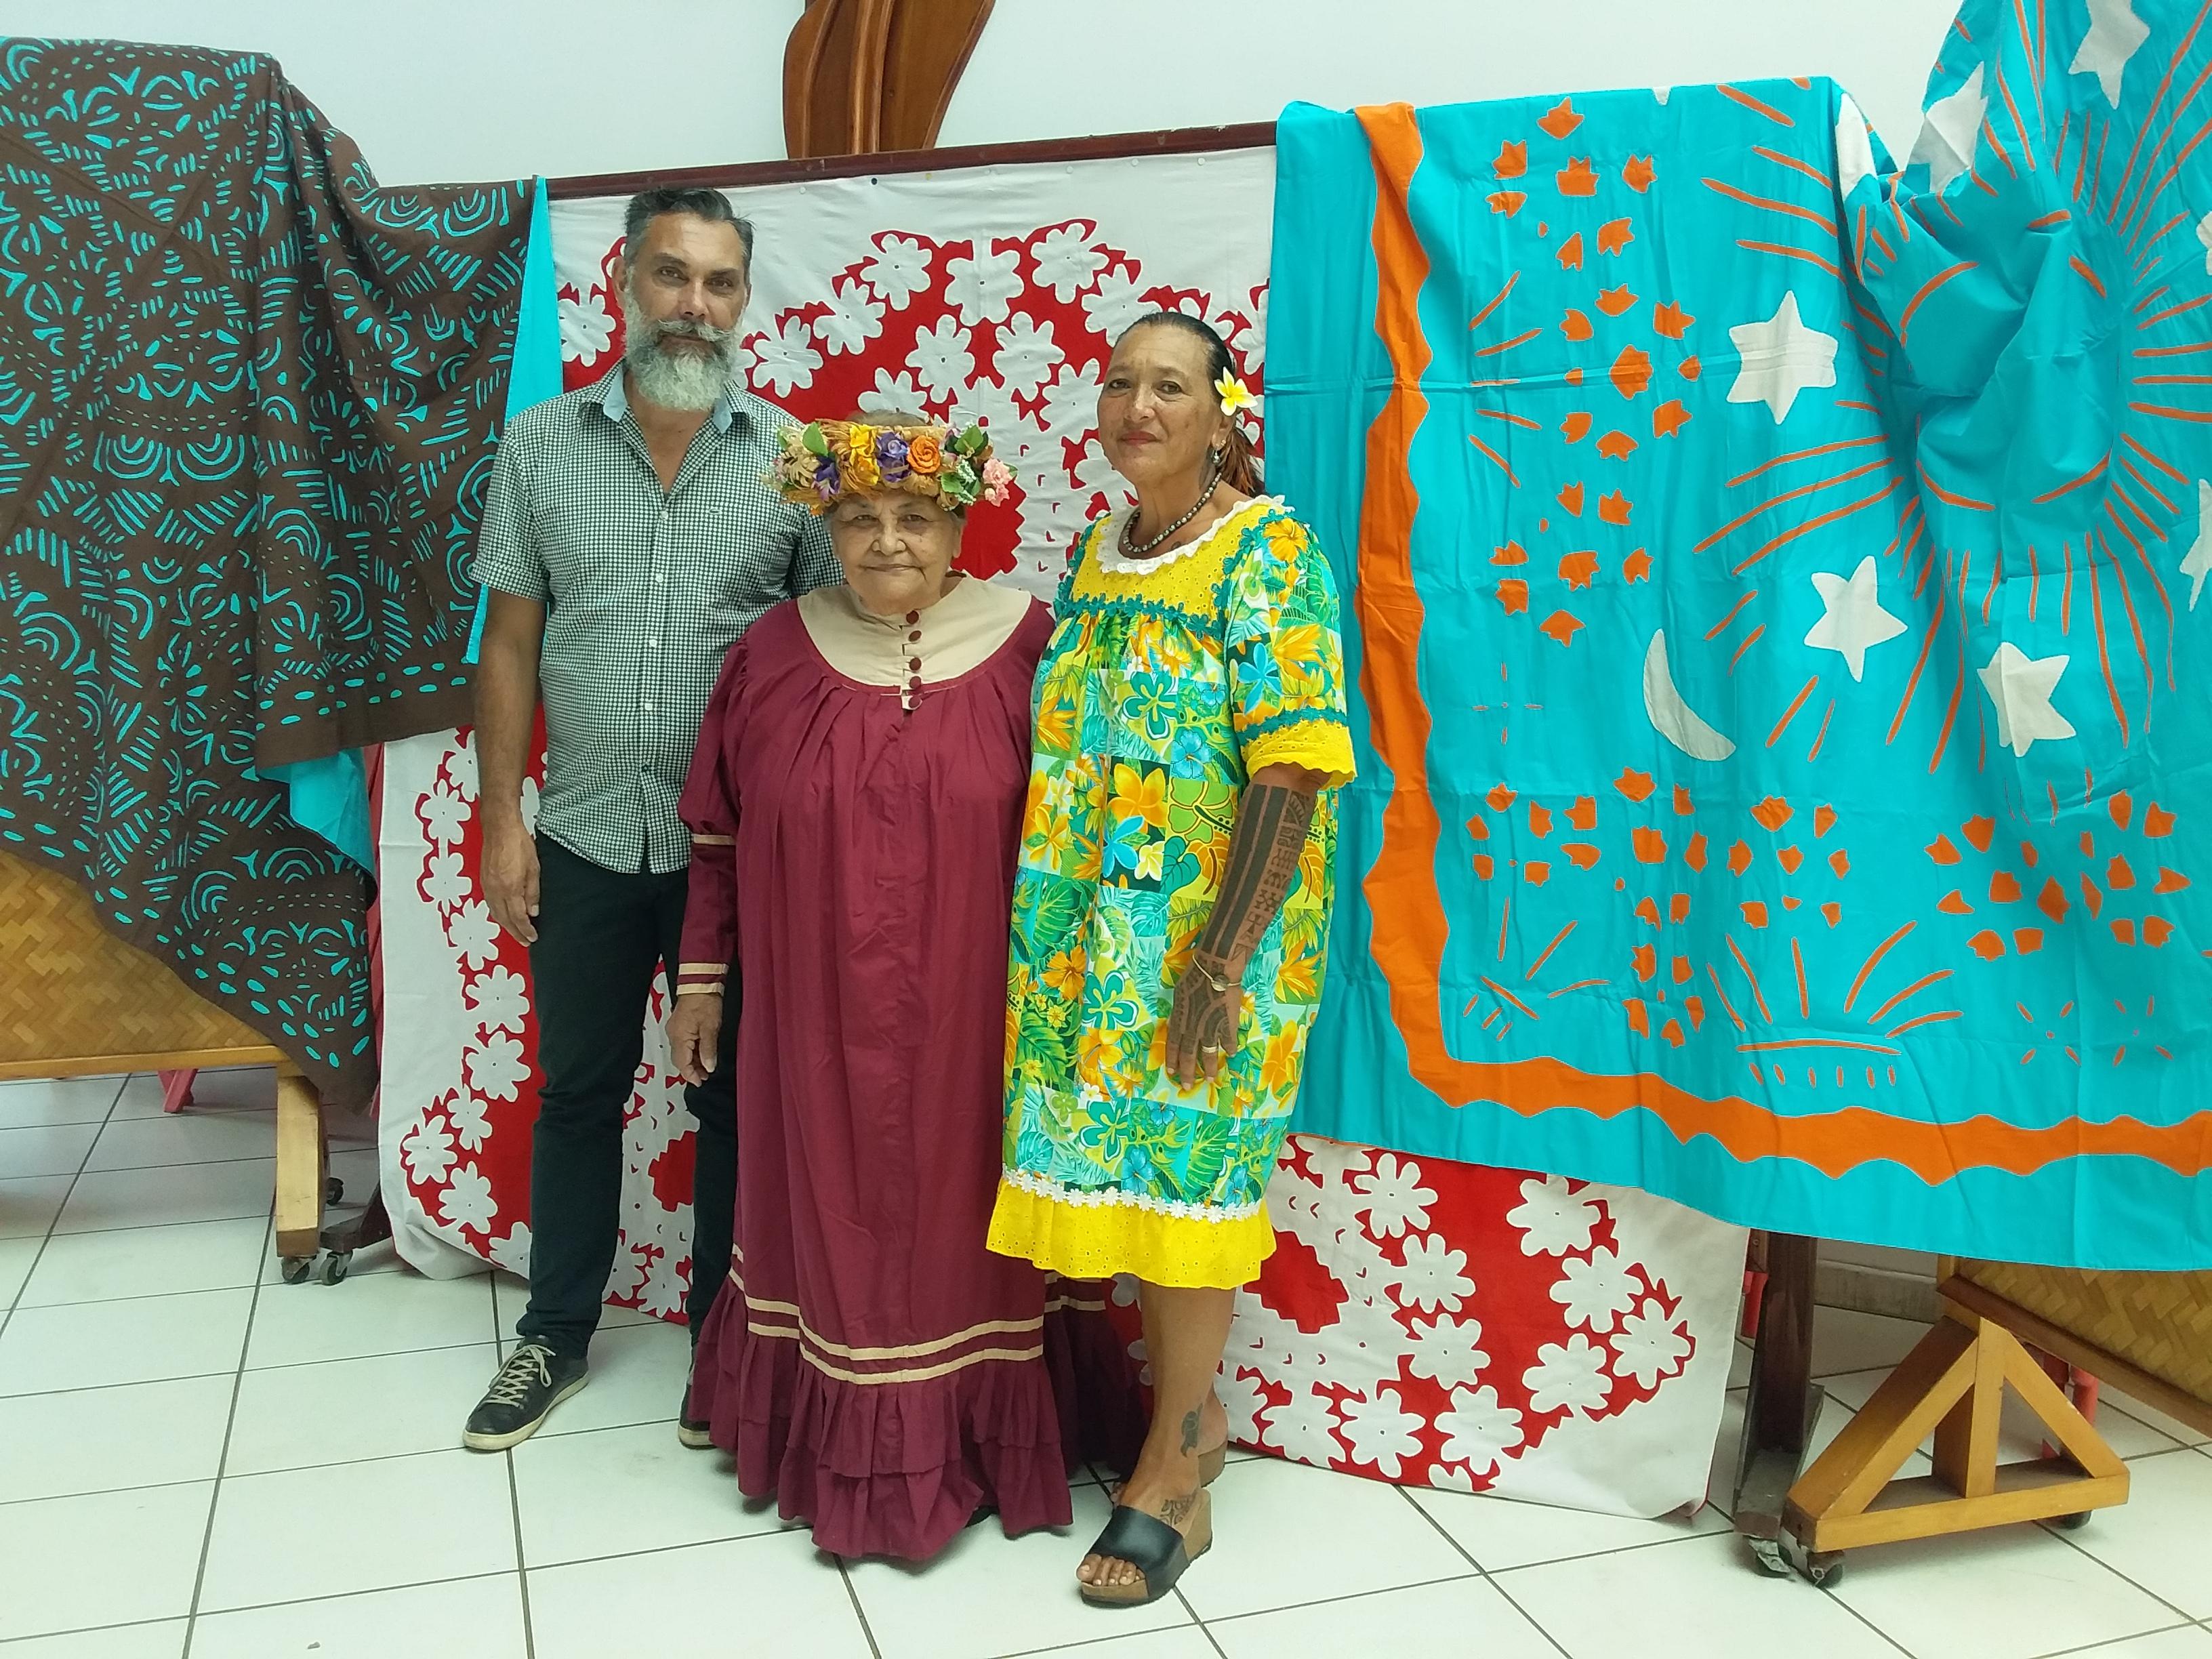 Jerry Biret, aux côtés de Virginie Biret, présidente de l'association Terama Nui, et Marie Rose Teuru-Taiarui, 8e adjointe chargée de la culture à la mairie de Punaauia.